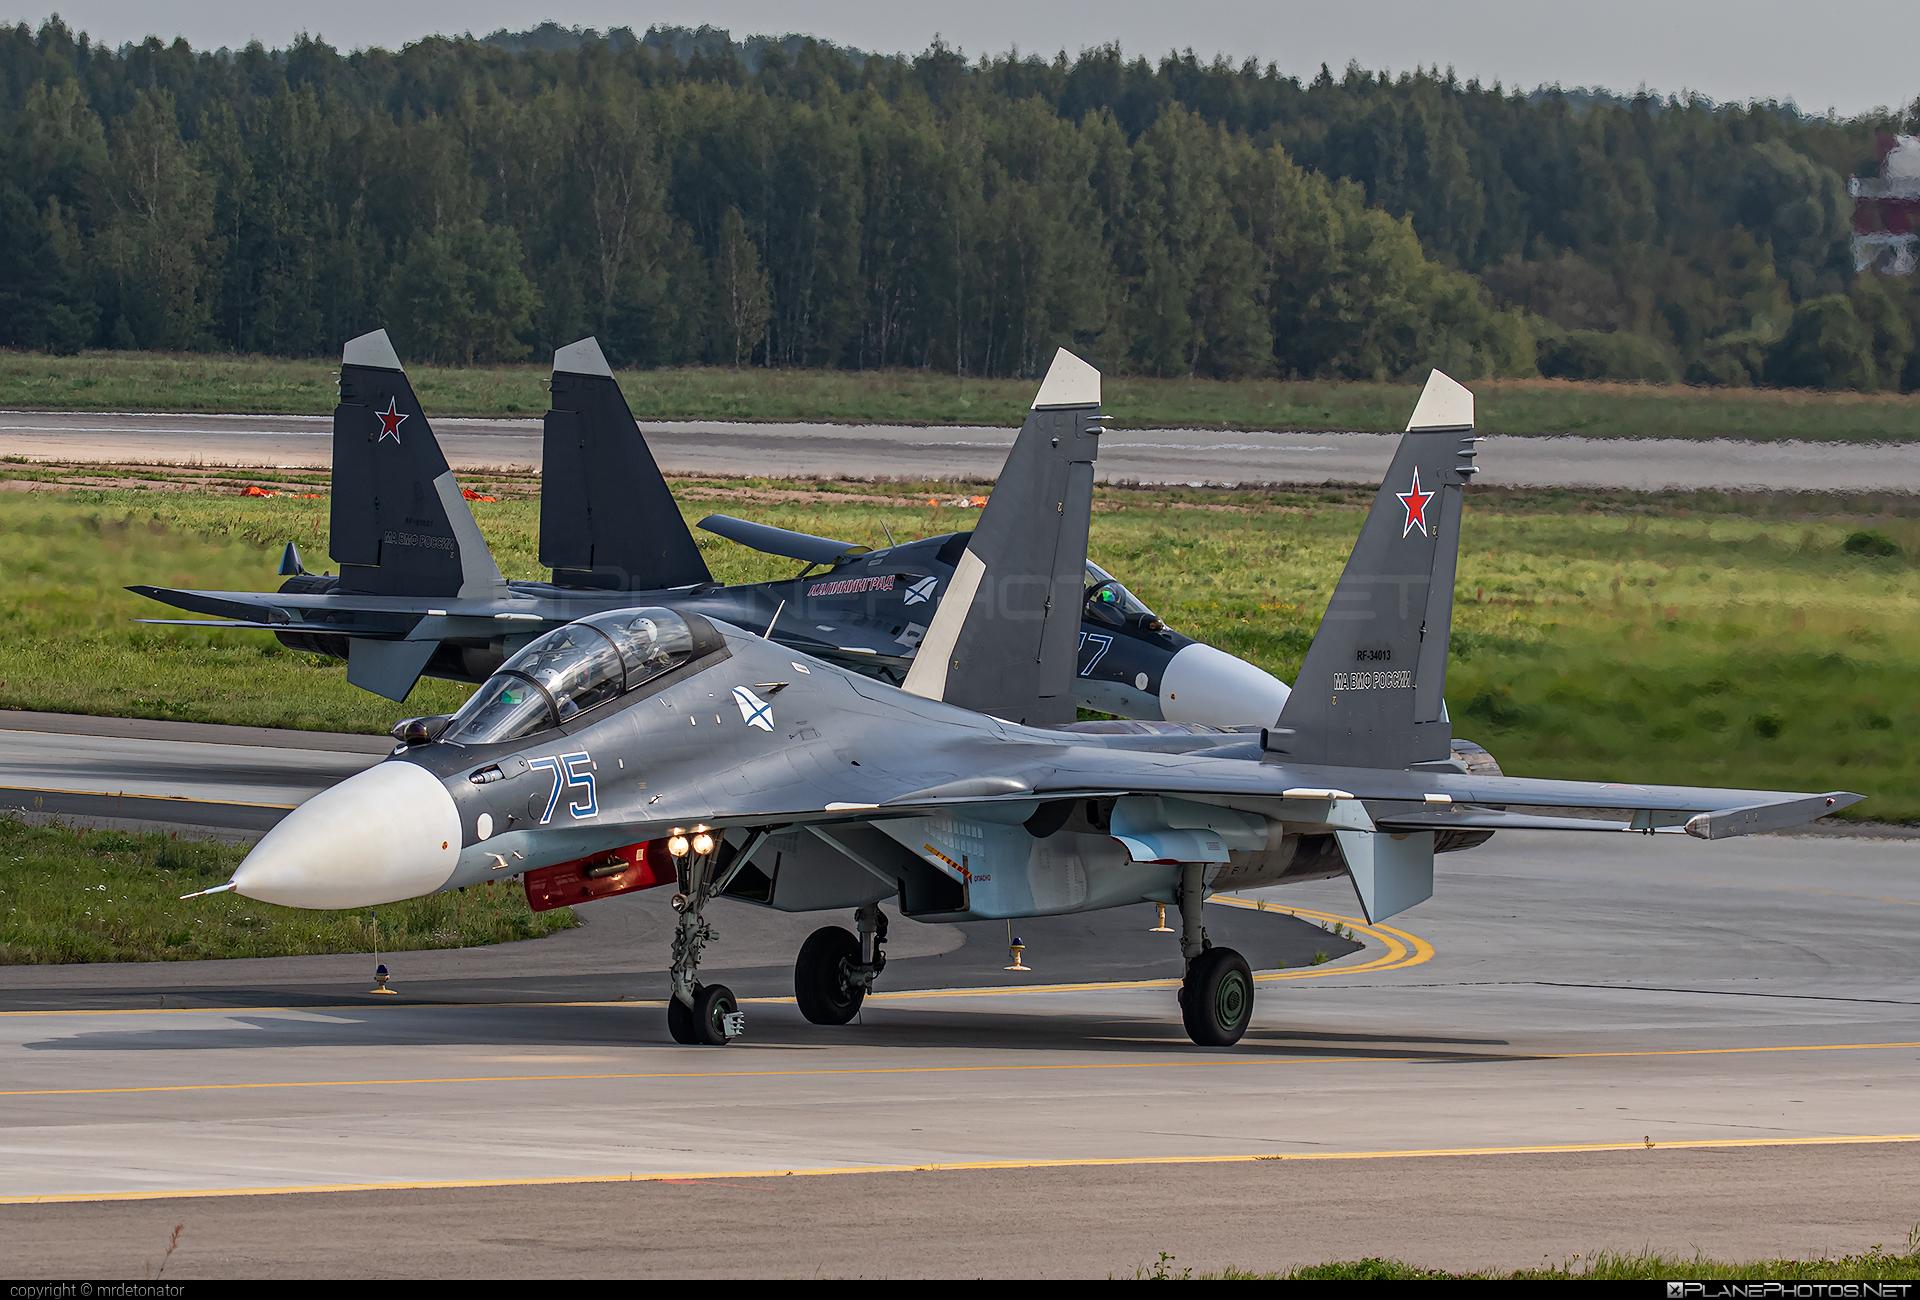 Sukhoi Su-30SM - RF-34013 operated by Voyenno-morskoy flot Rossii (Russian Navy) #maks2019 #su30 #su30sm #sukhoi #sukhoi30 #sukhoisu30sm